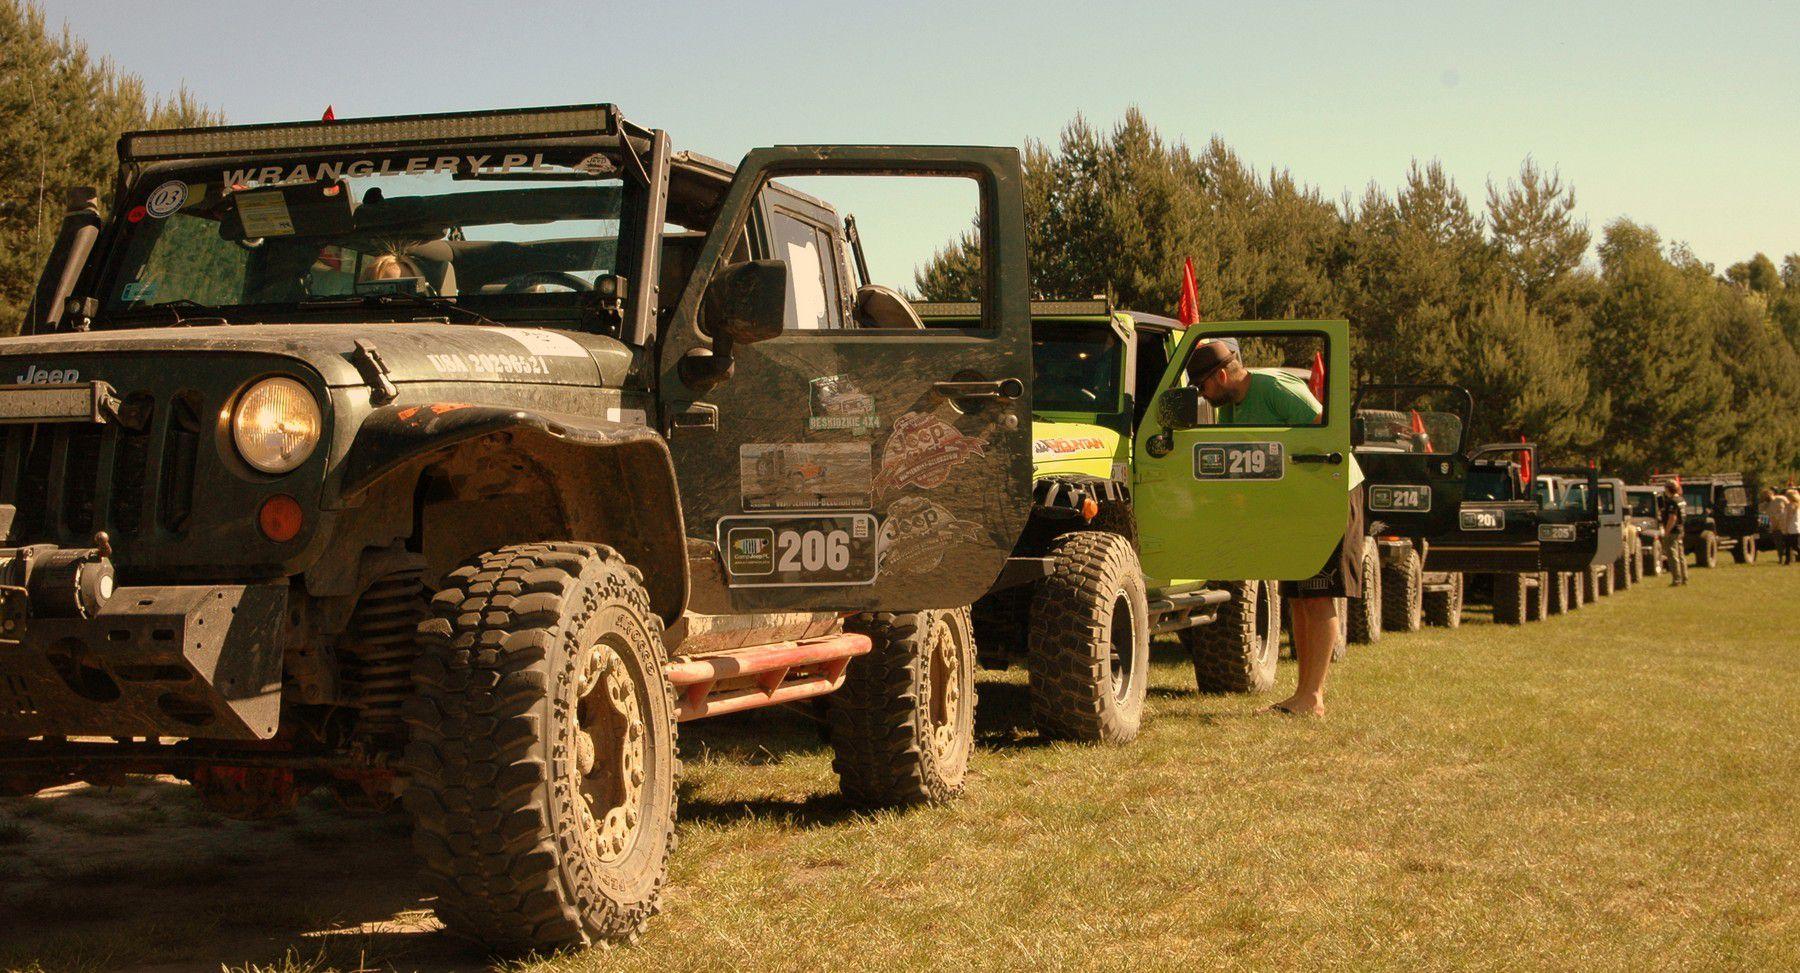 Camp Jeep PL 2015